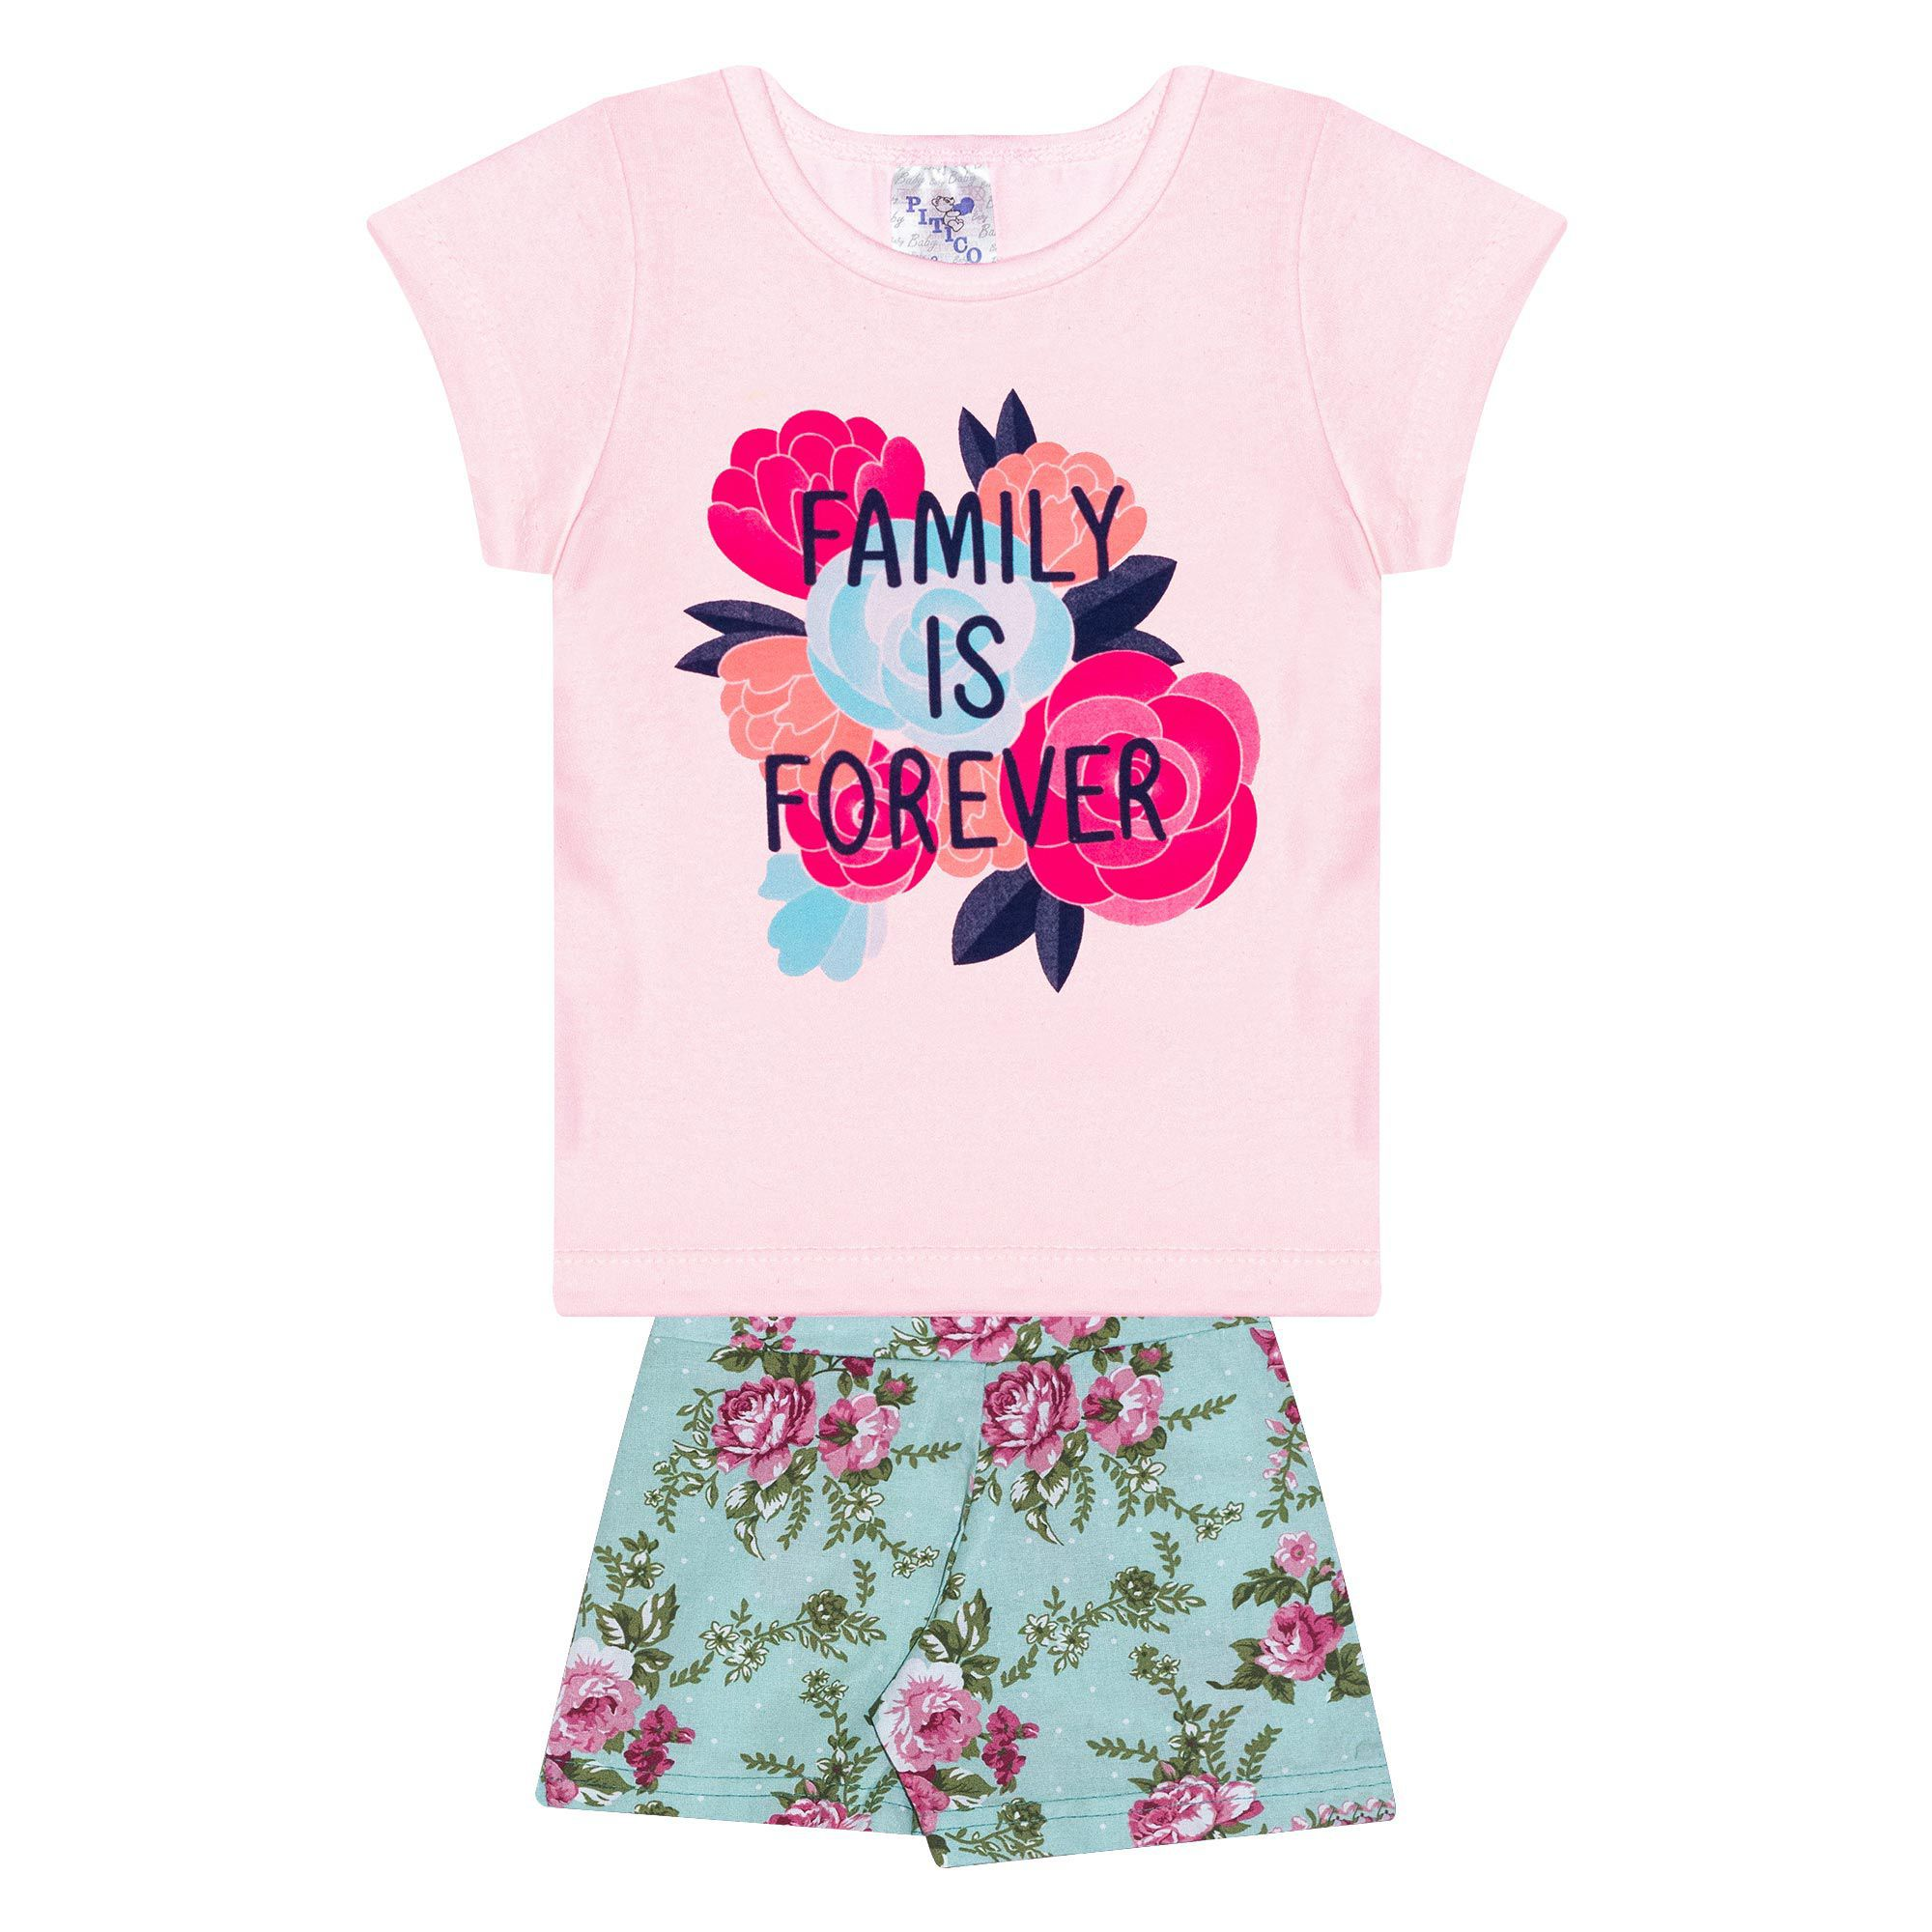 Conjunto Infantil Feminino - Ref 1028 - Rosa/Verde - Pitico